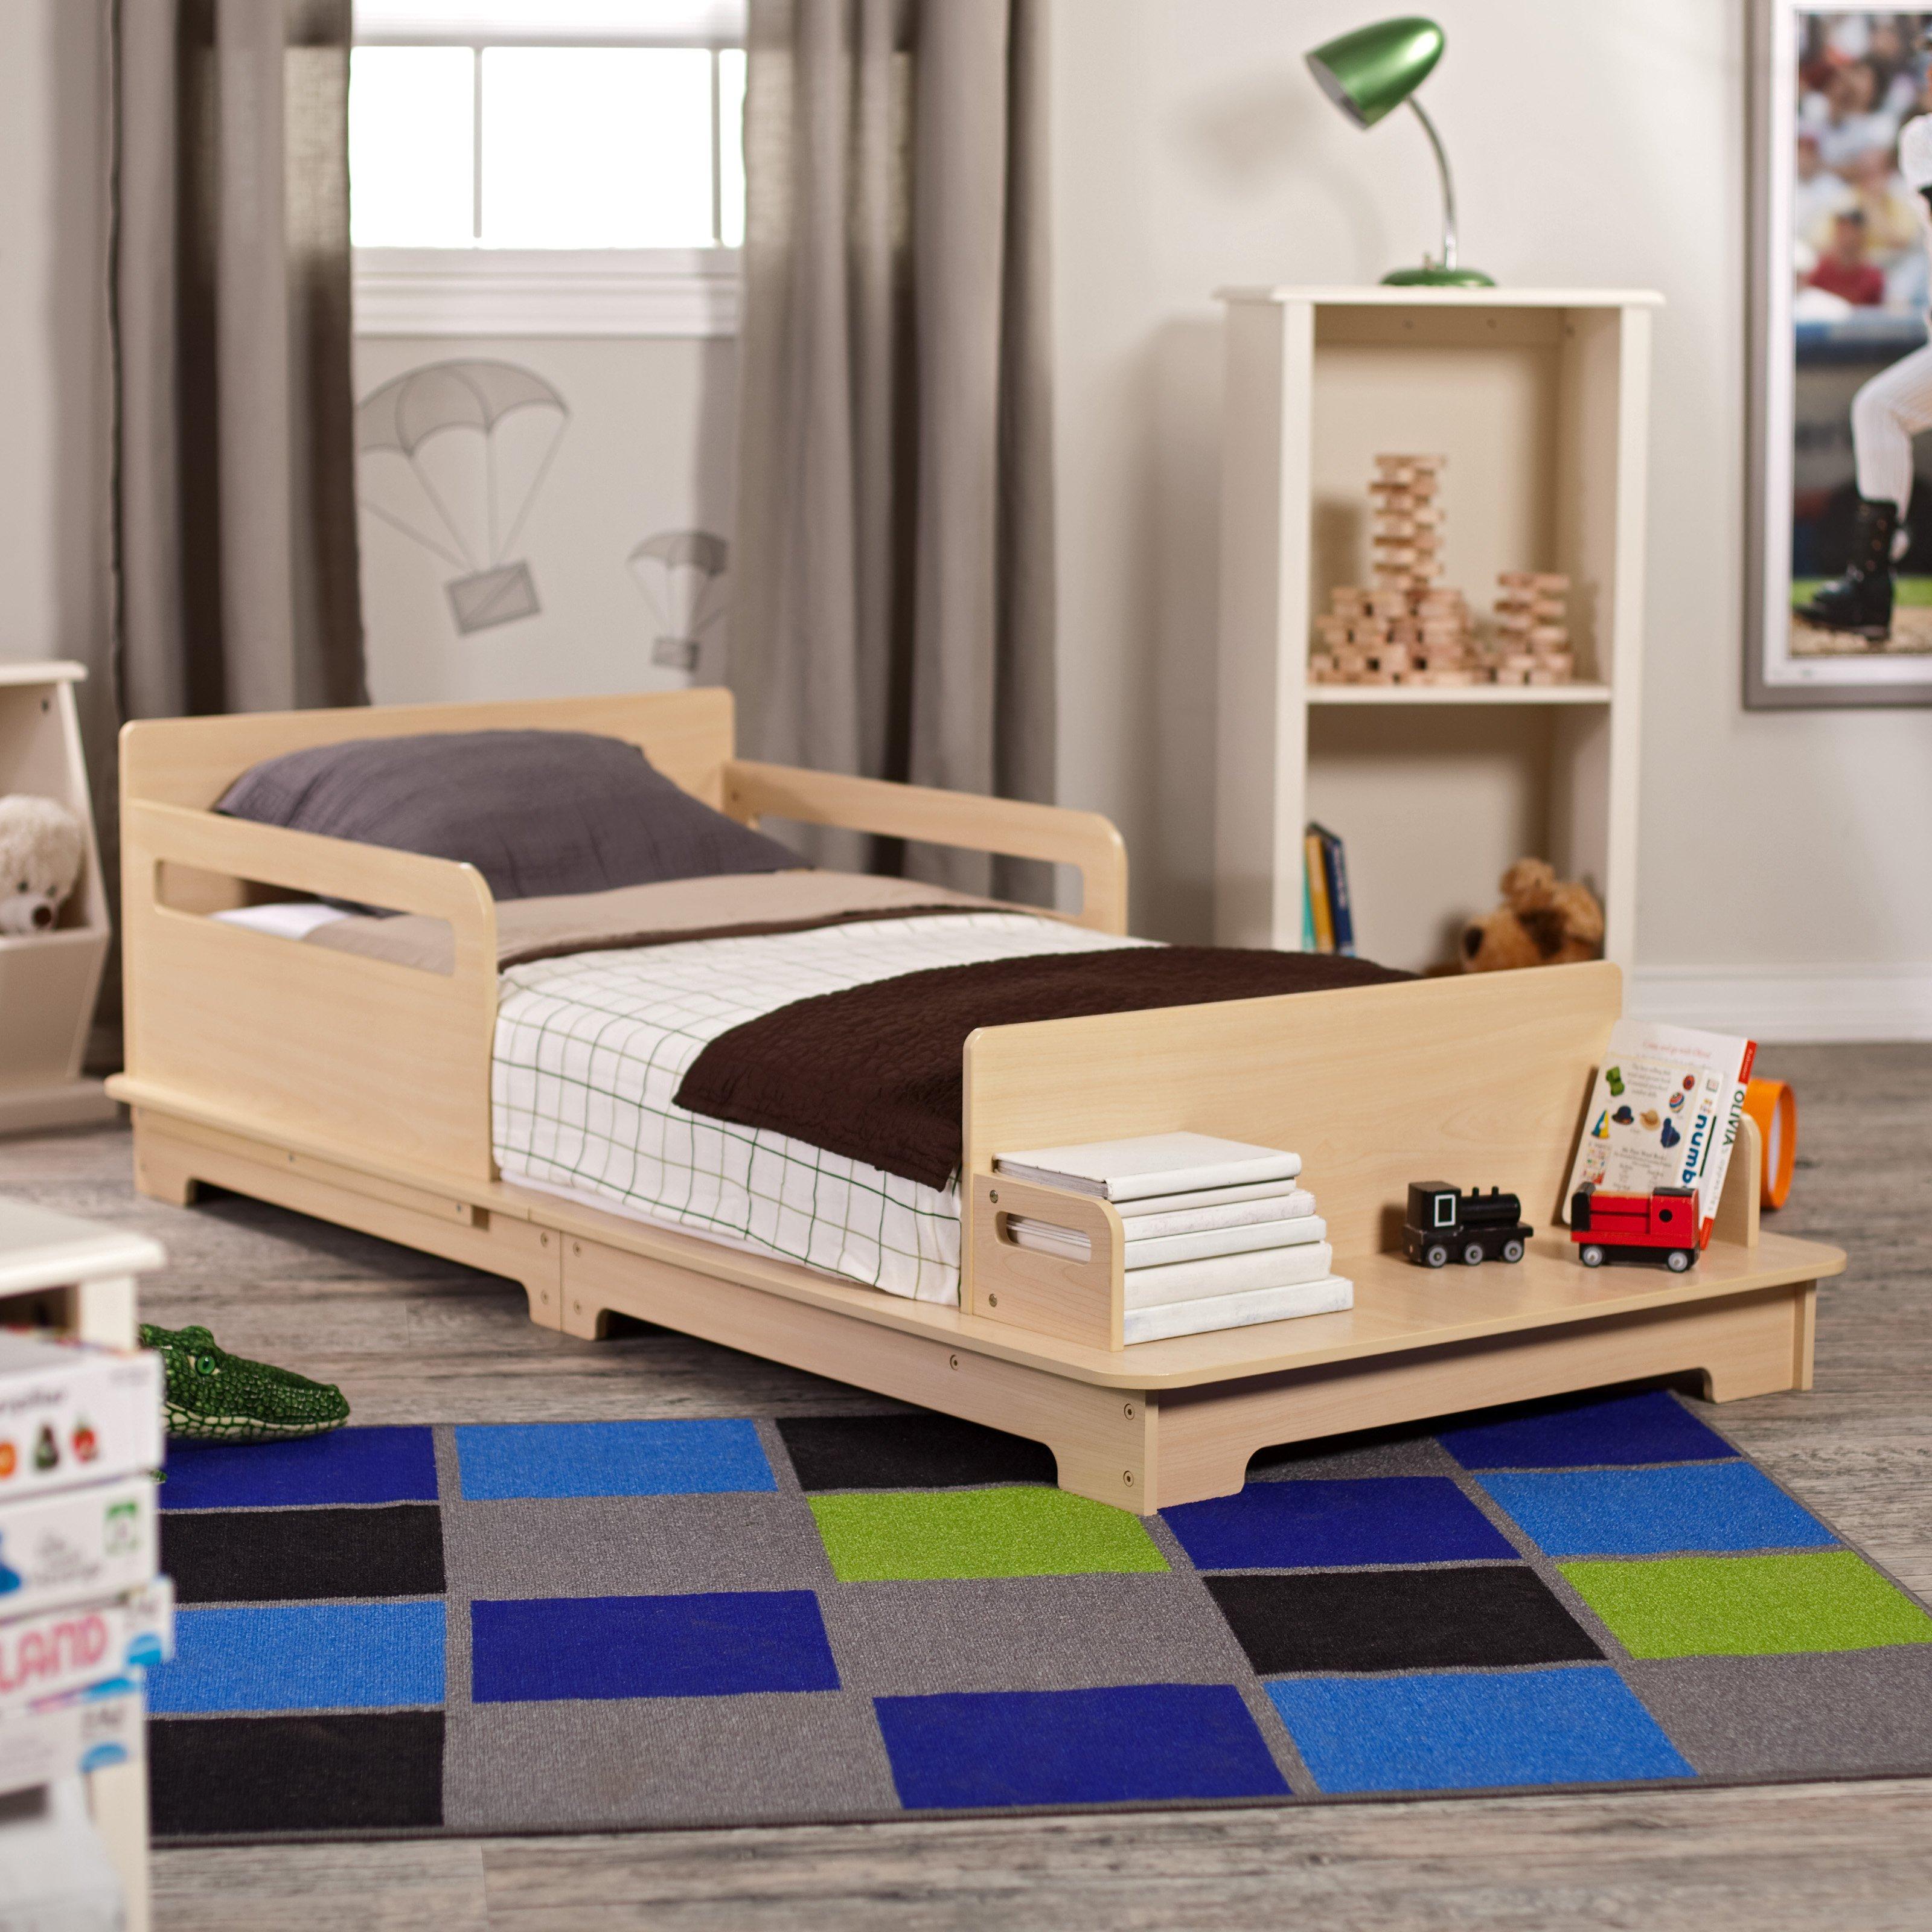 KidKraft Modern Toddler Bed - 86921